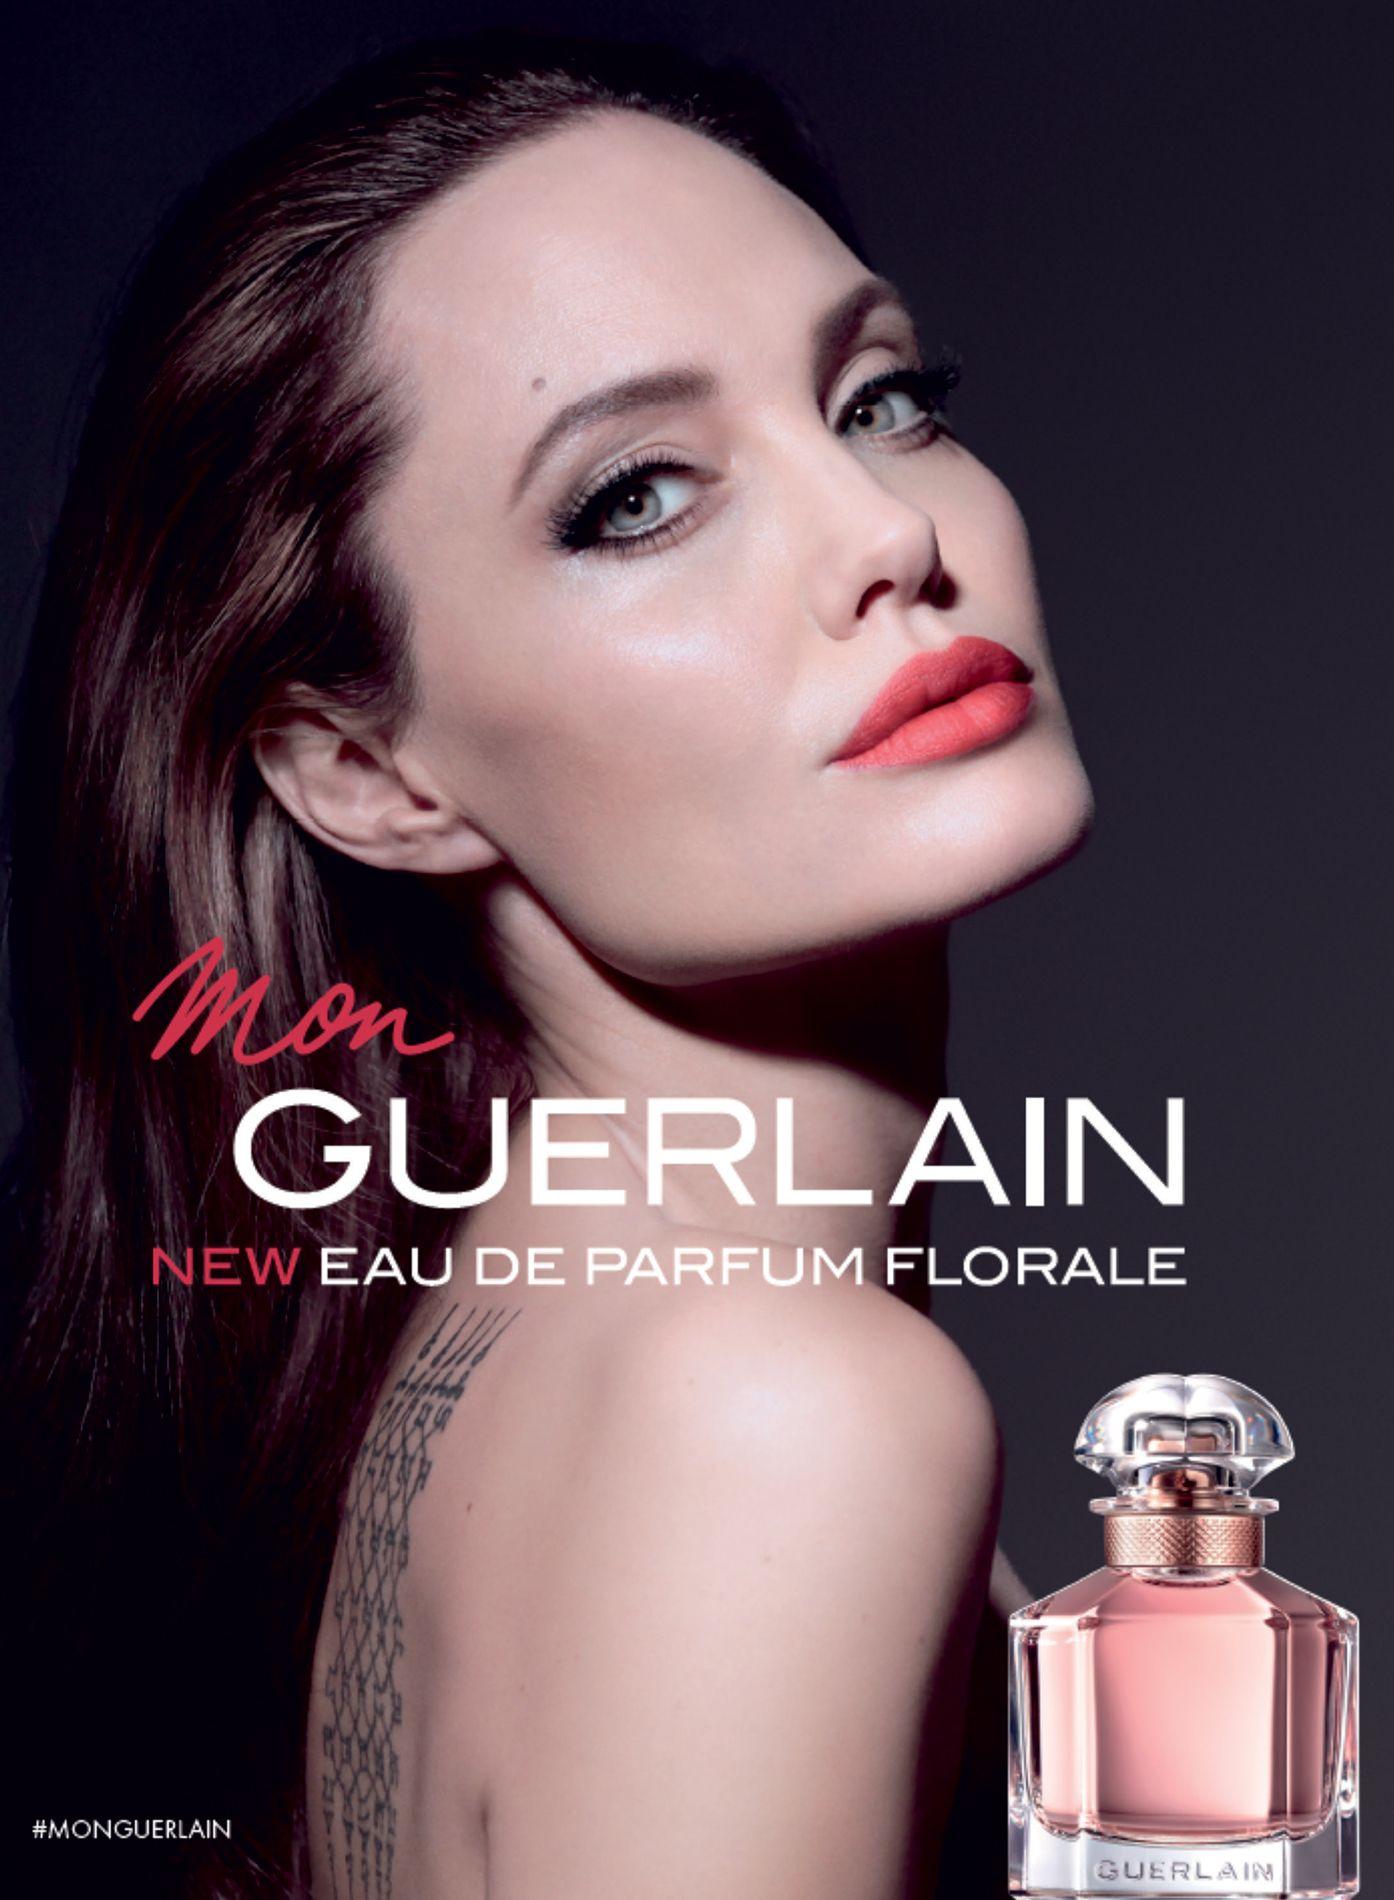 Джоли Angelina Jolie GuerlainPerfume 2019 В ГАнджелина 4ARj3L5q